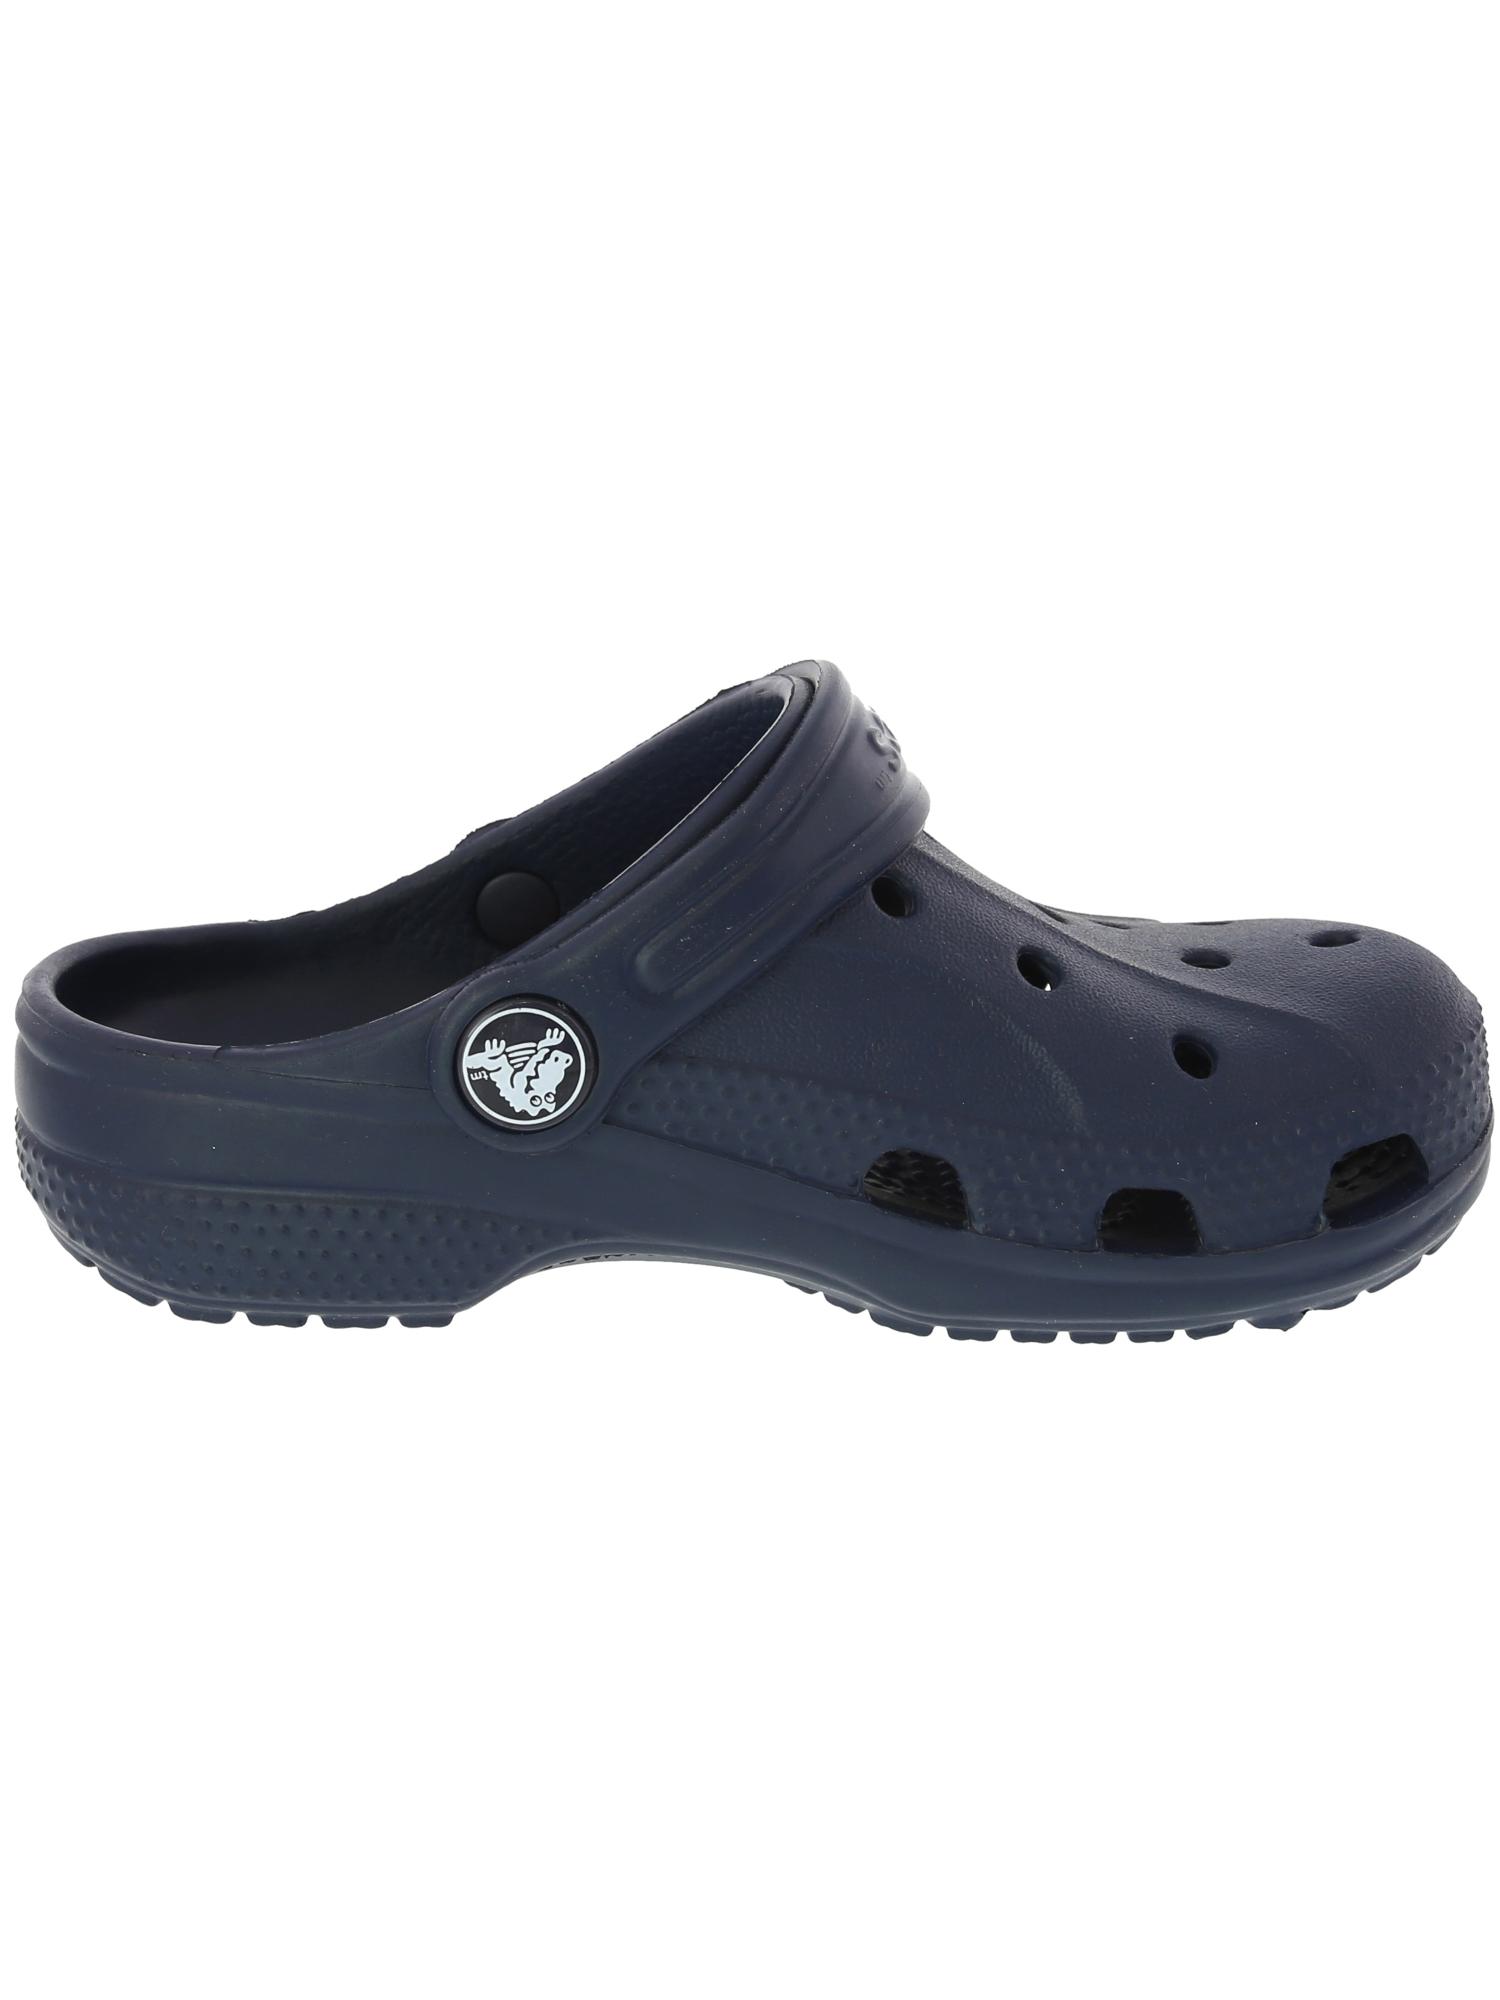 Crocs-Ralen-Clog-Ankle-High-Clogs thumbnail 5